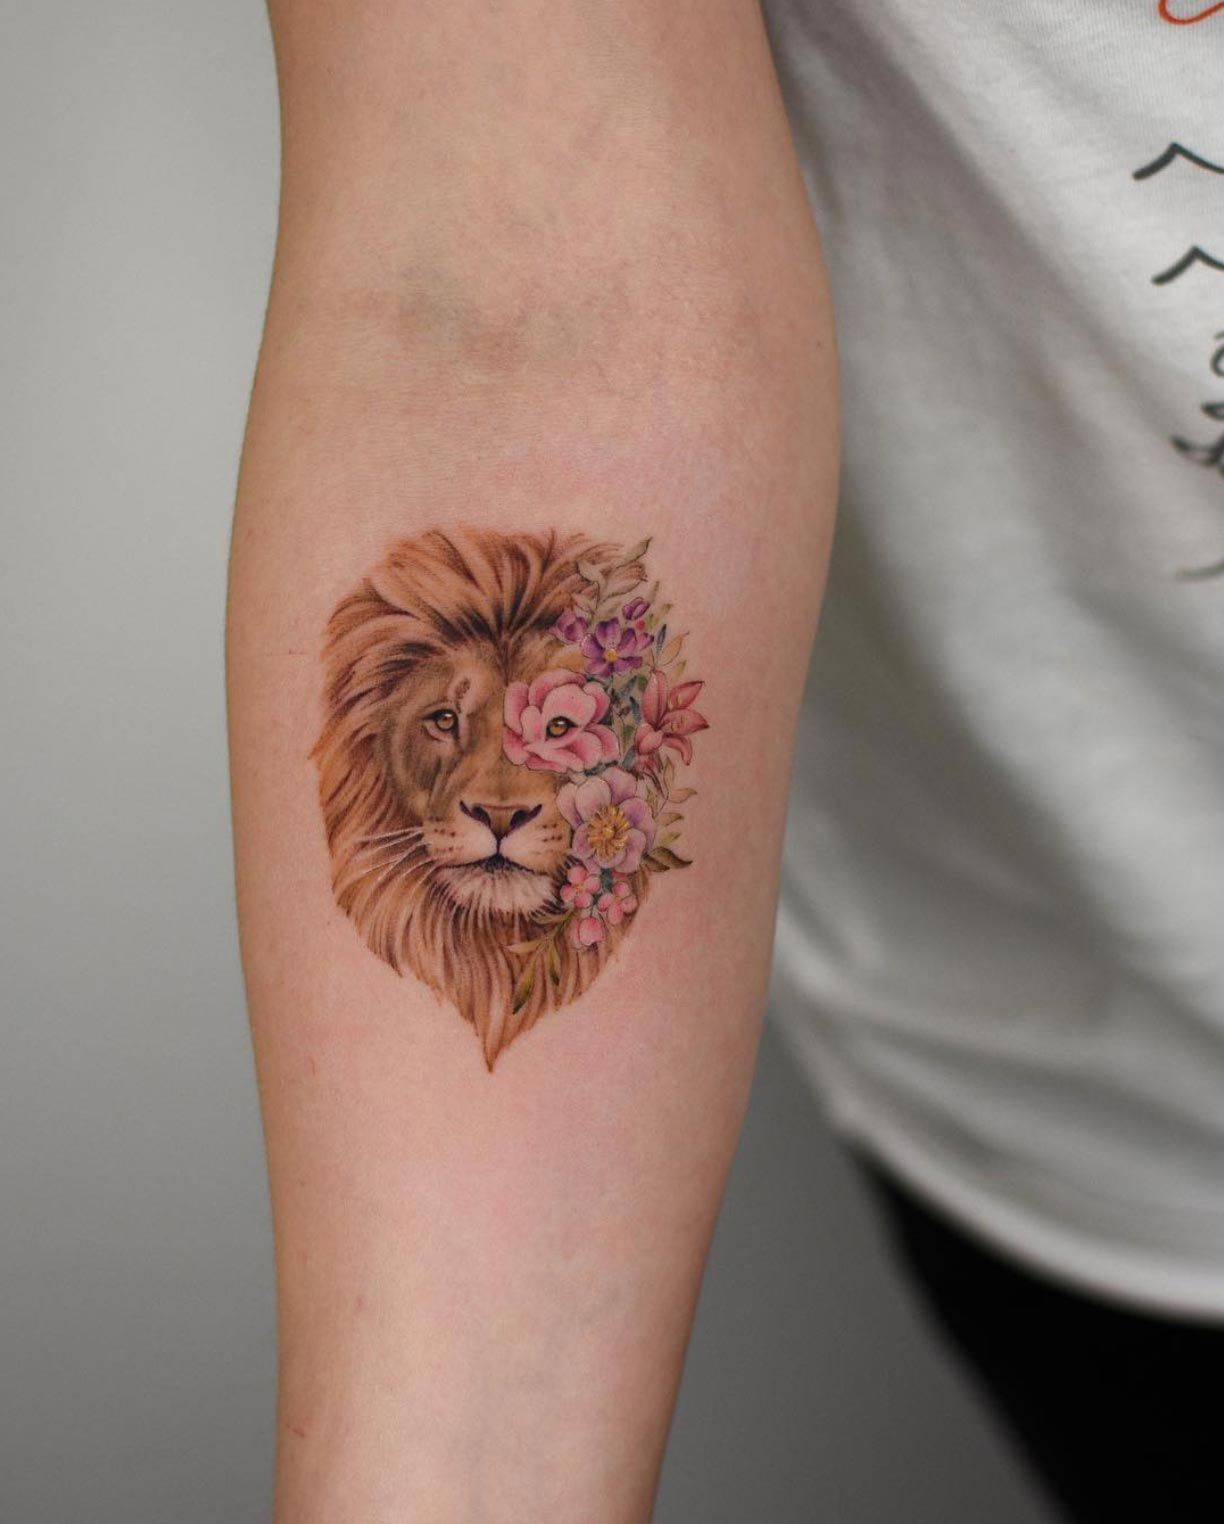 By Bryan Gutierrez Gorgeous Tattoos Tattoos Small Lion Tattoo For Women